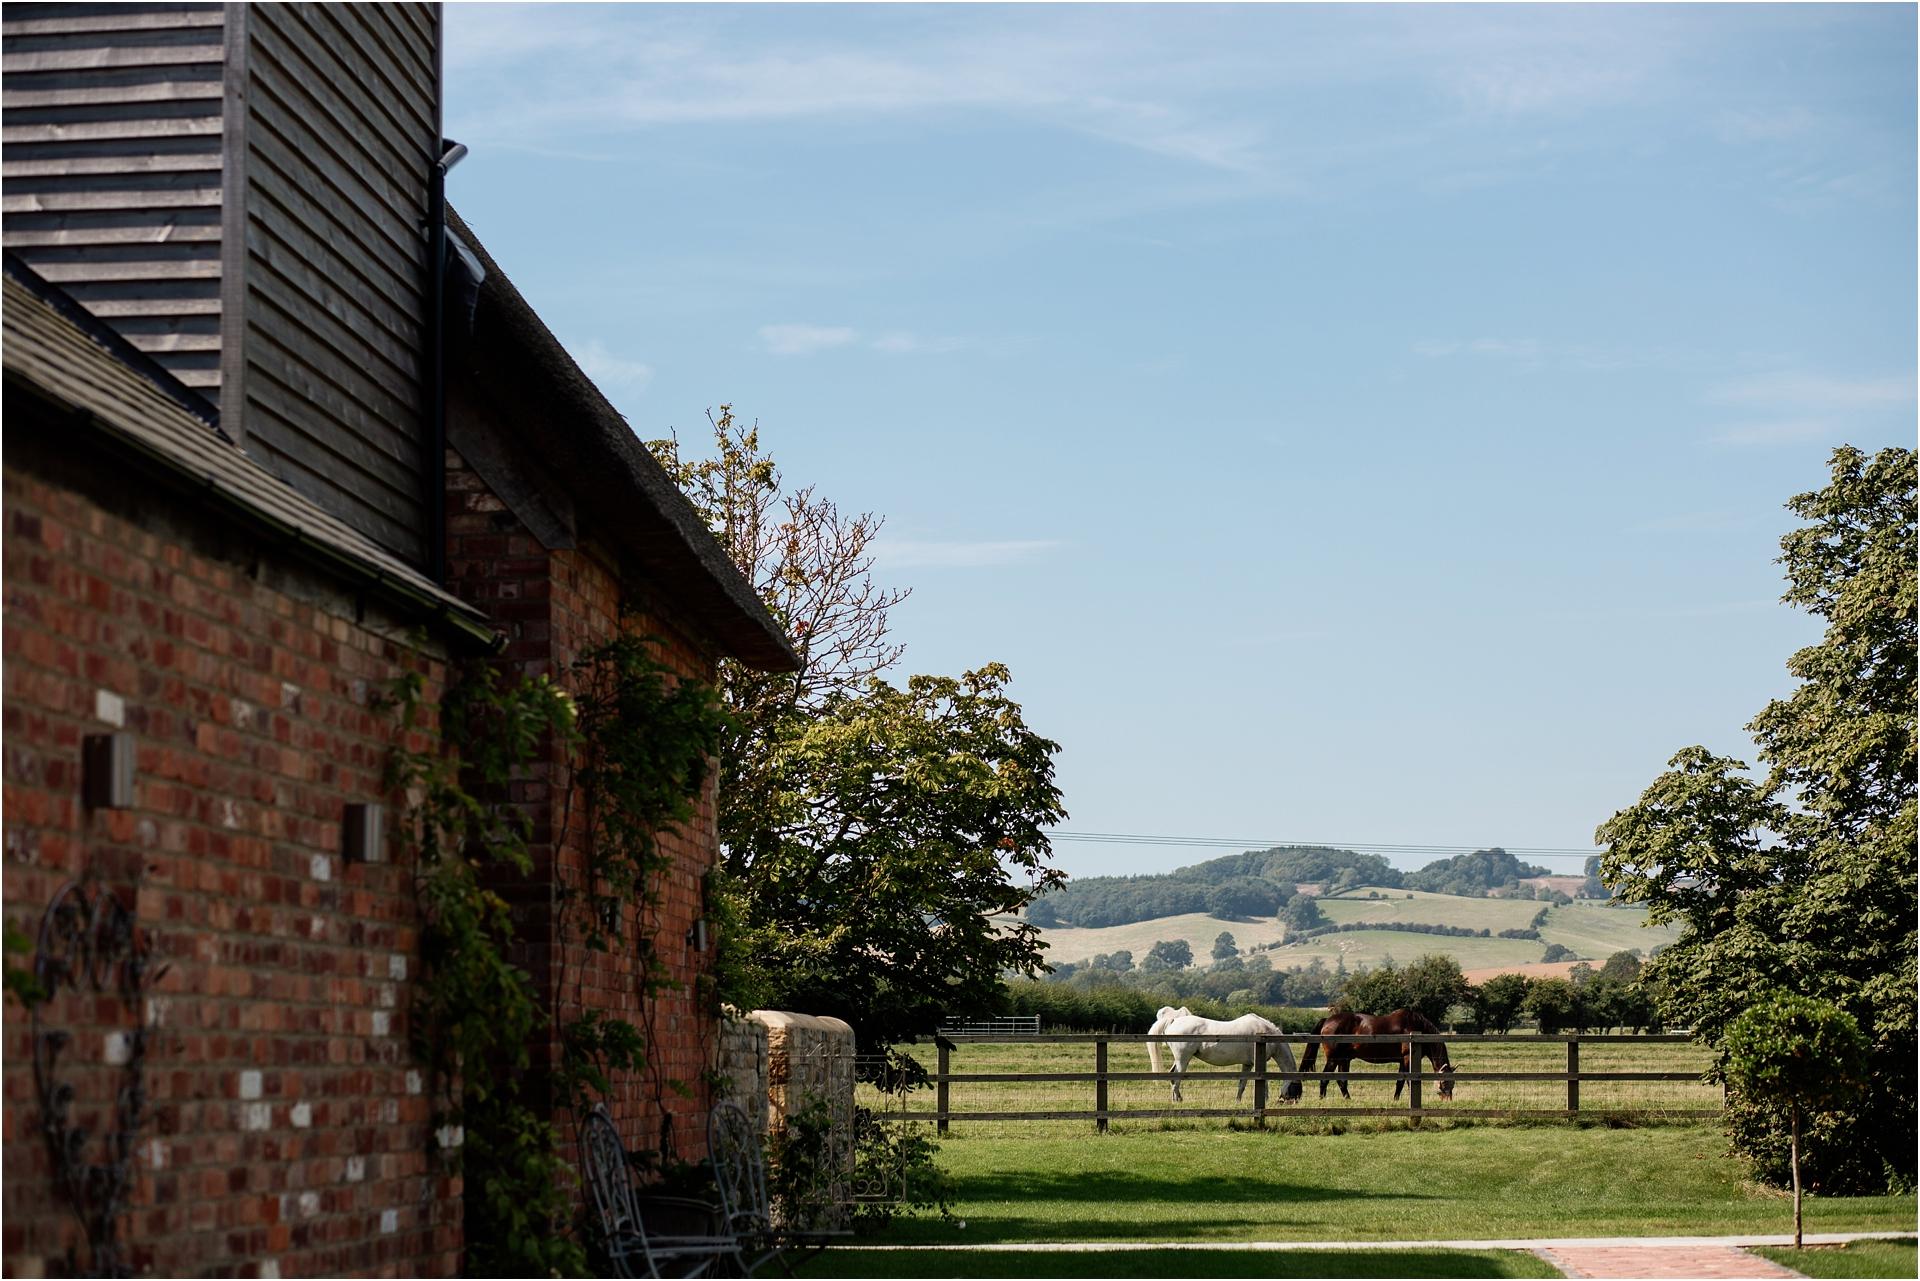 Blackwell Grange Thatch Barn